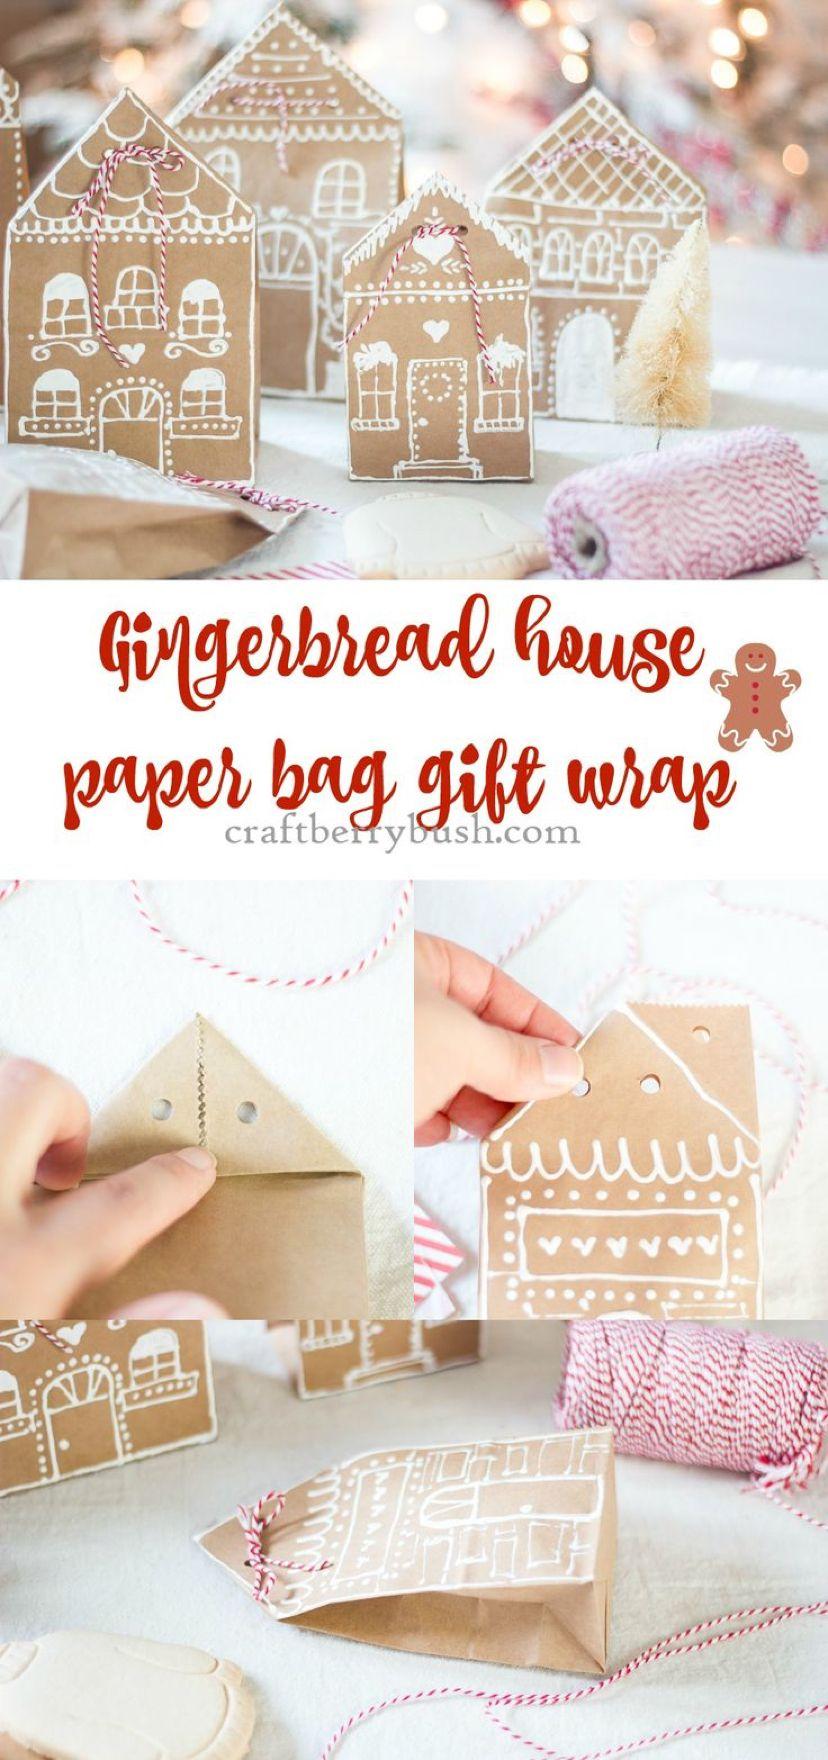 Gingerbread house paper bag gift wrap | Hmb | Pinterest | Christmas ...